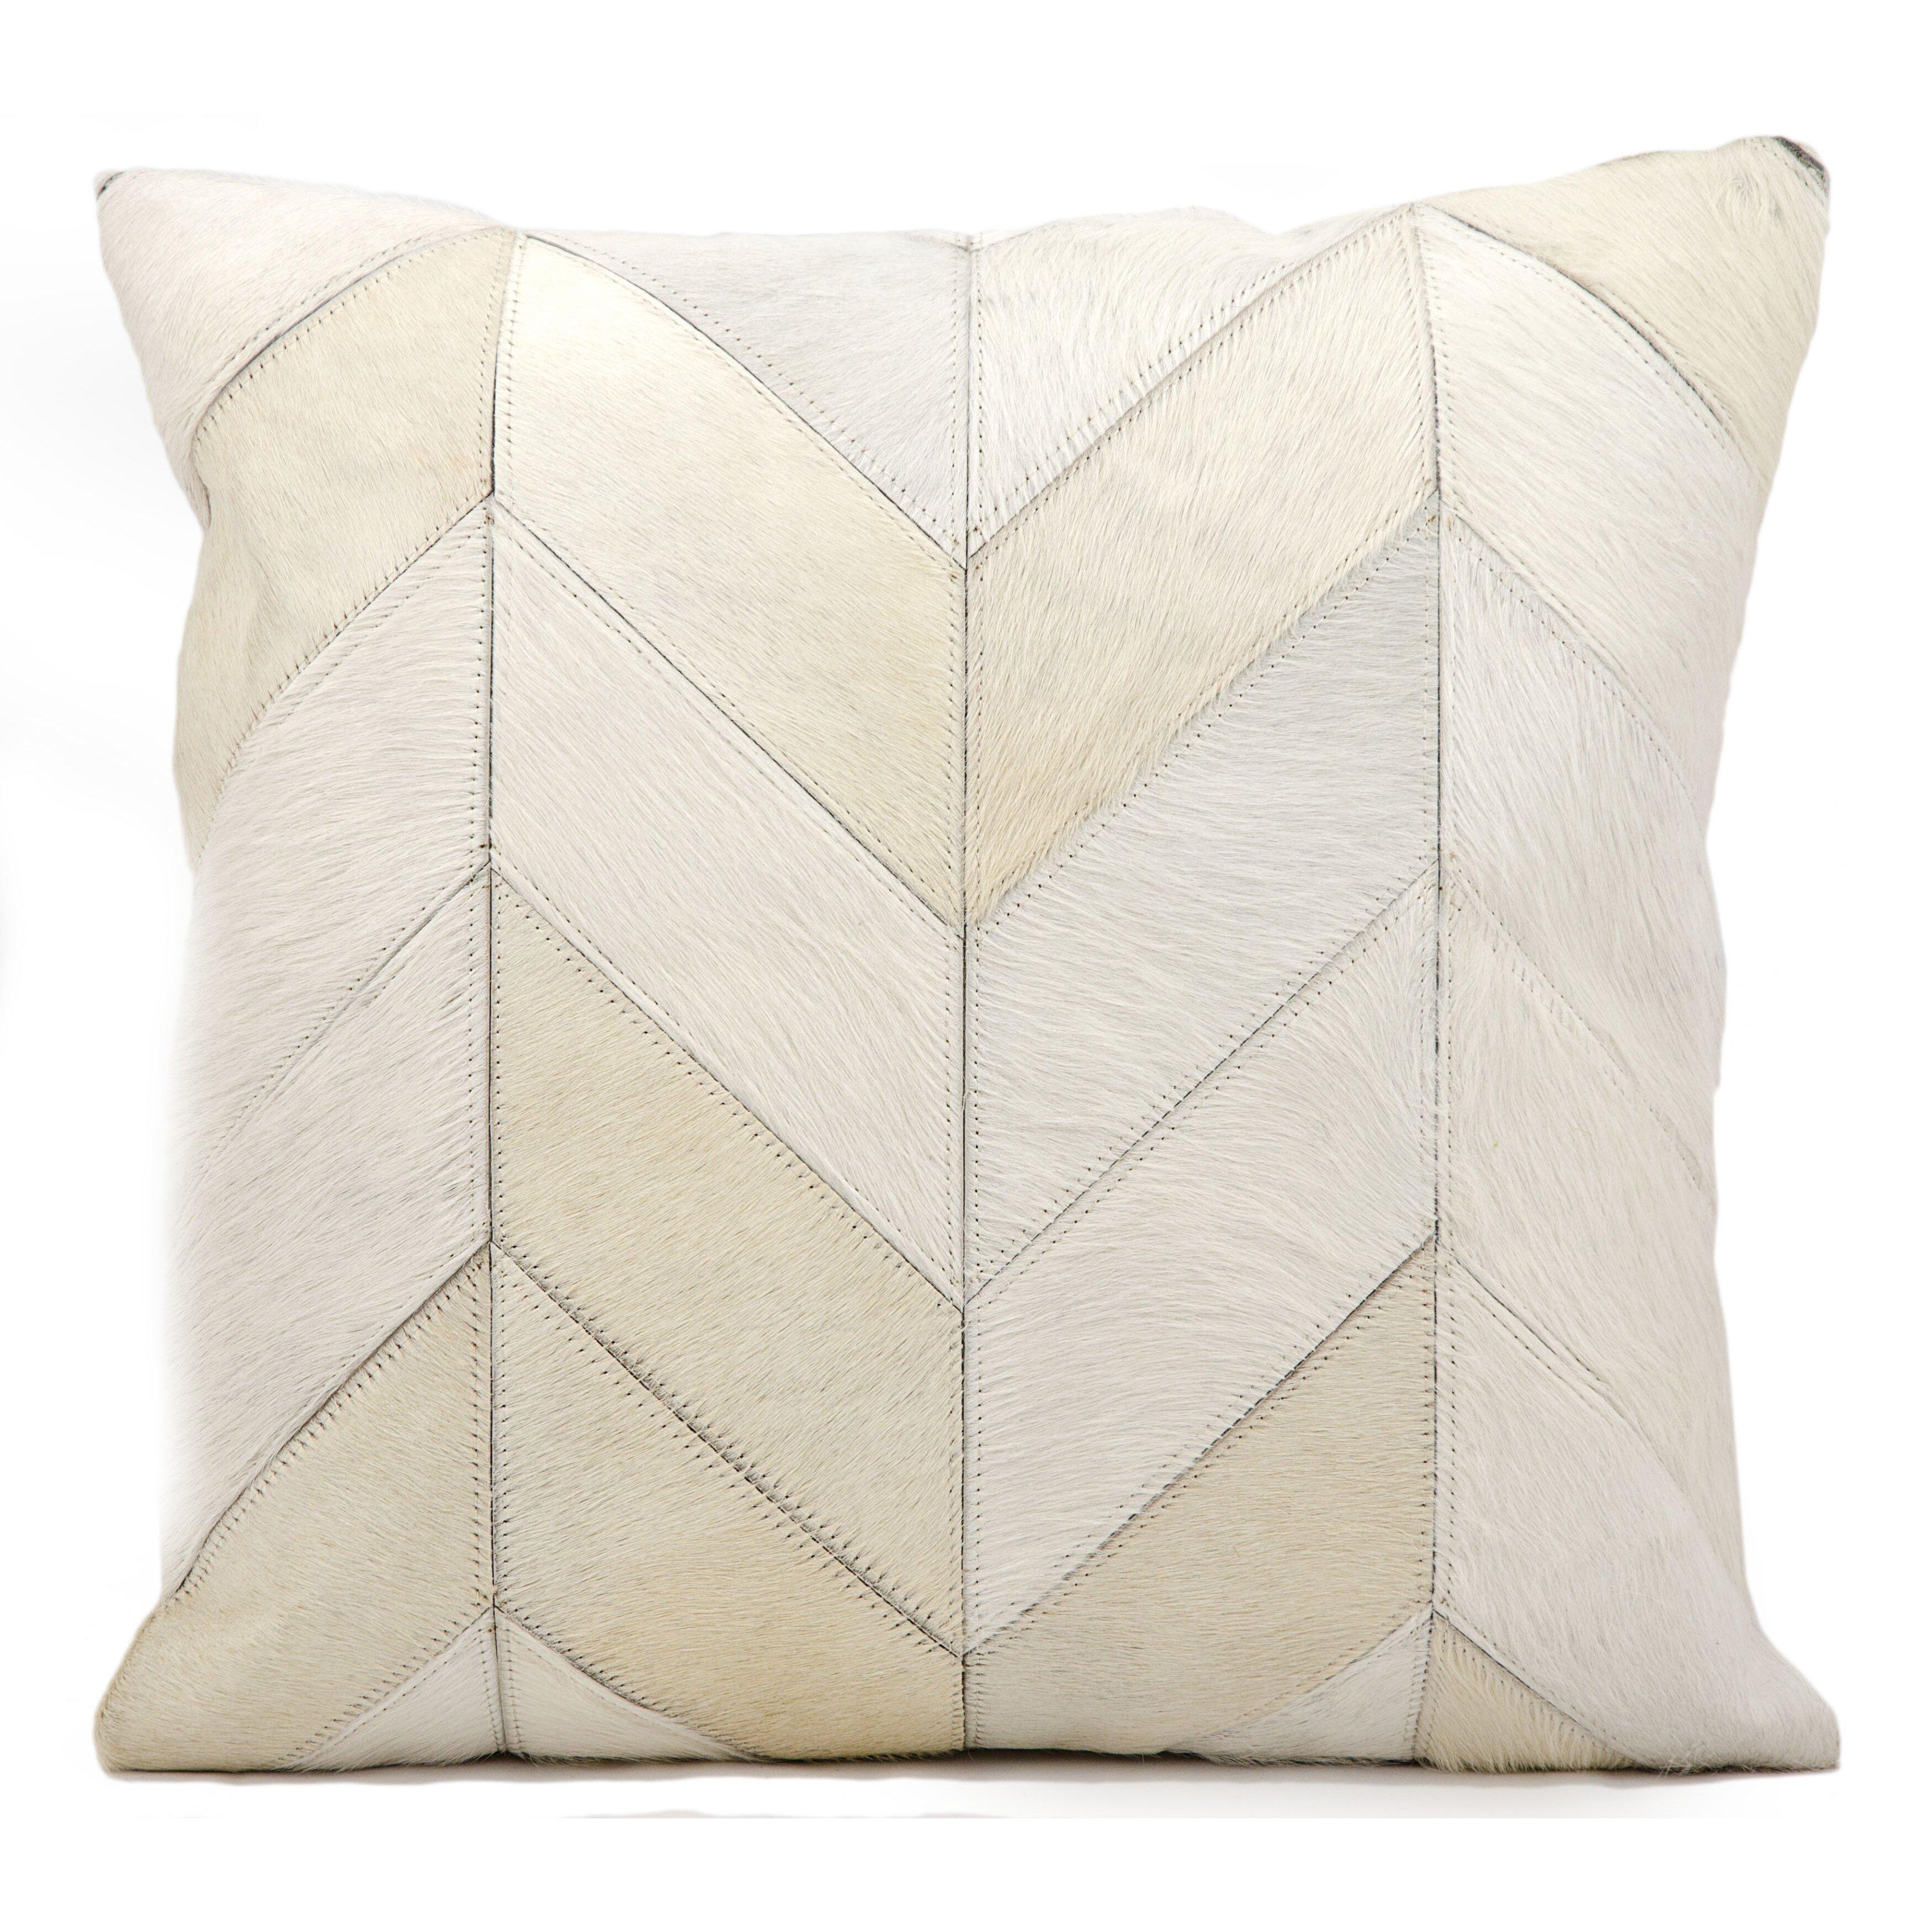 Kathy Ireland Home Gallery Heritage Leather Throw Pillow & Reviews ... - Kathy Ireland Home Gallery Heritage Leather Throw Pillow